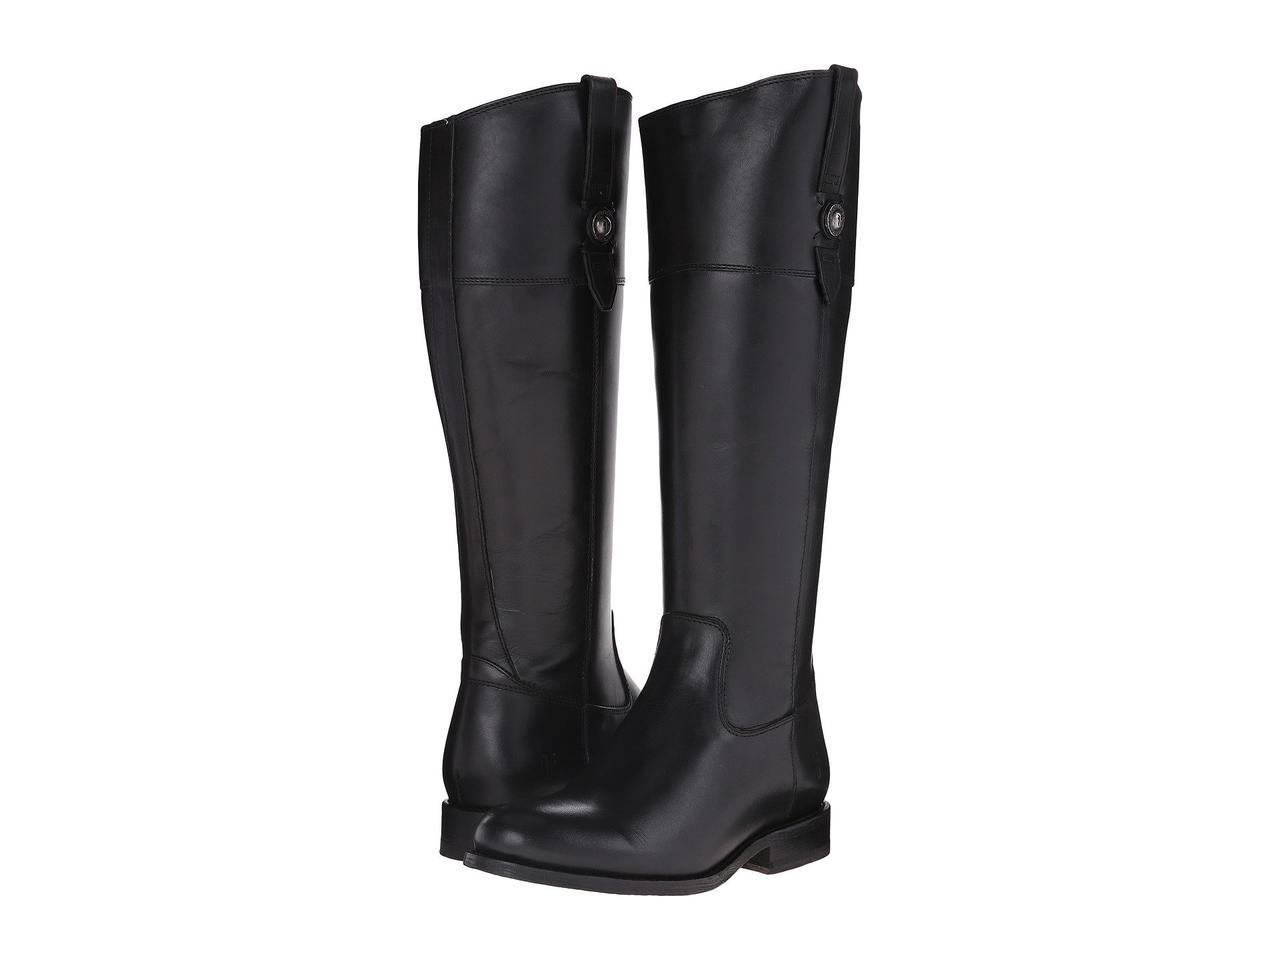 Ботинки Сапоги (Оригинал) Frye Jayden Button Tall Black Smooth Vintage  Leather - TopUSA 2e7000e7450